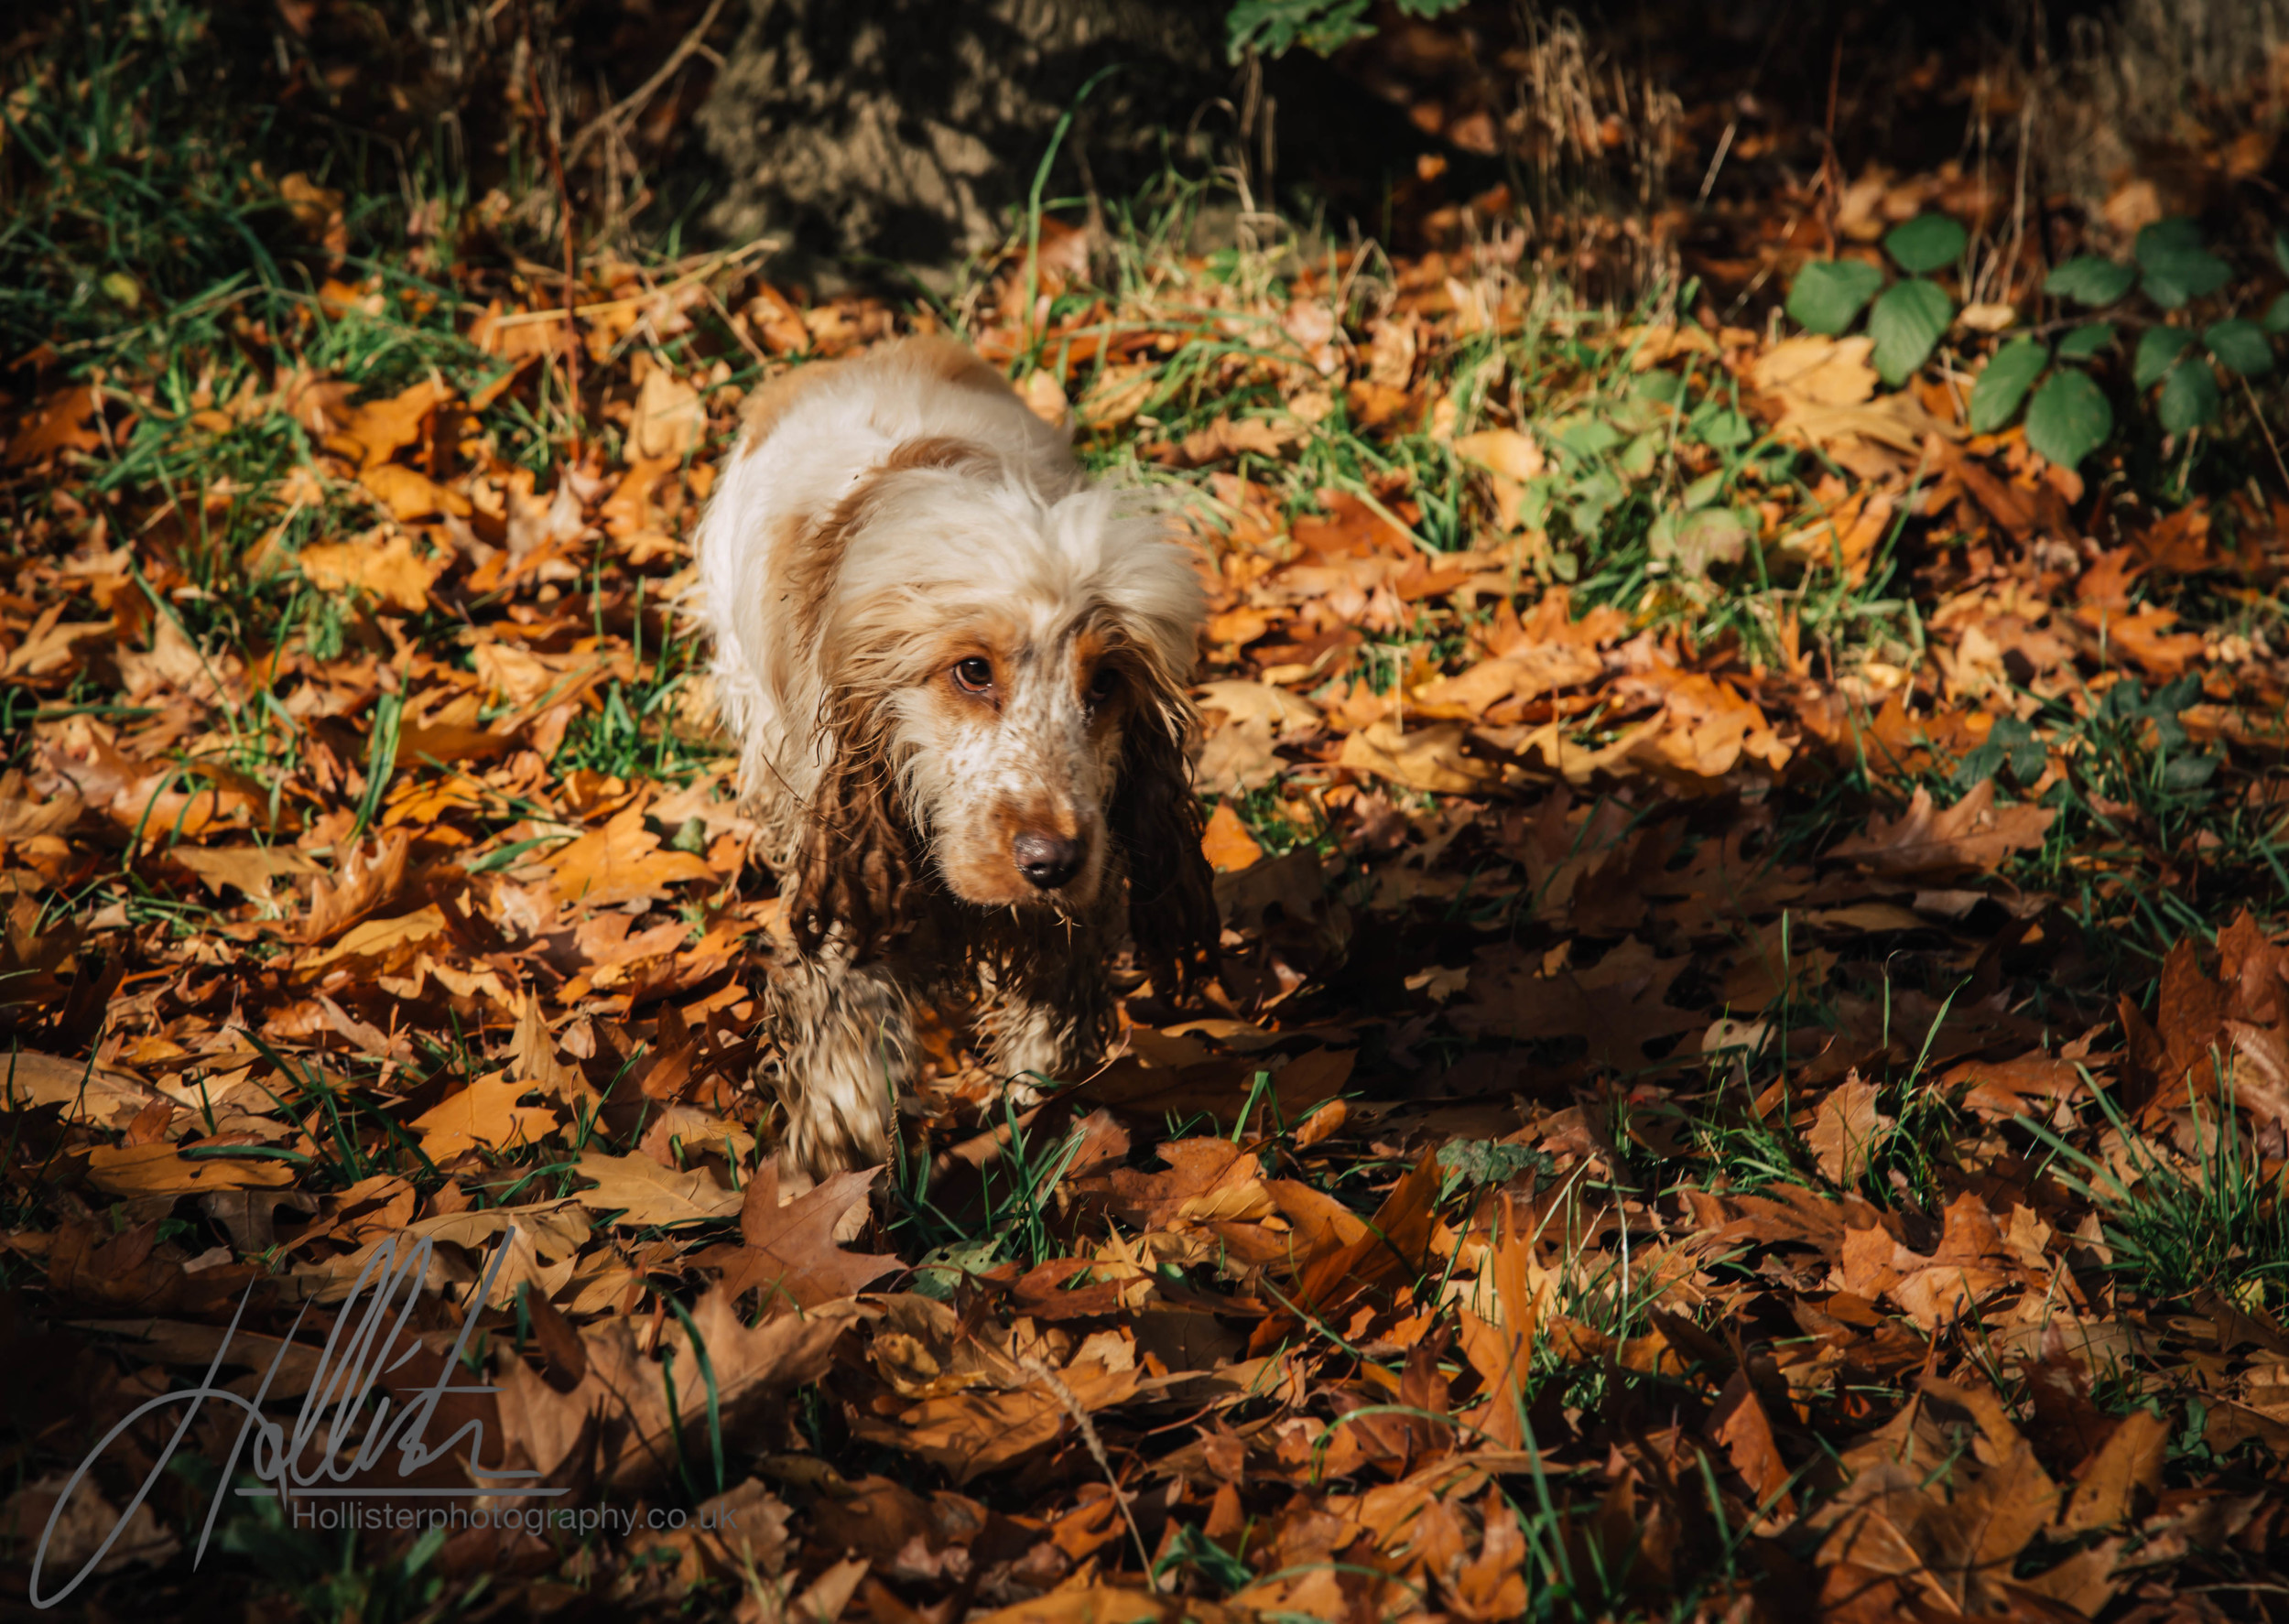 Hollisterphotography ABBY CLOWES WOOD DOG WALK-62.JPG